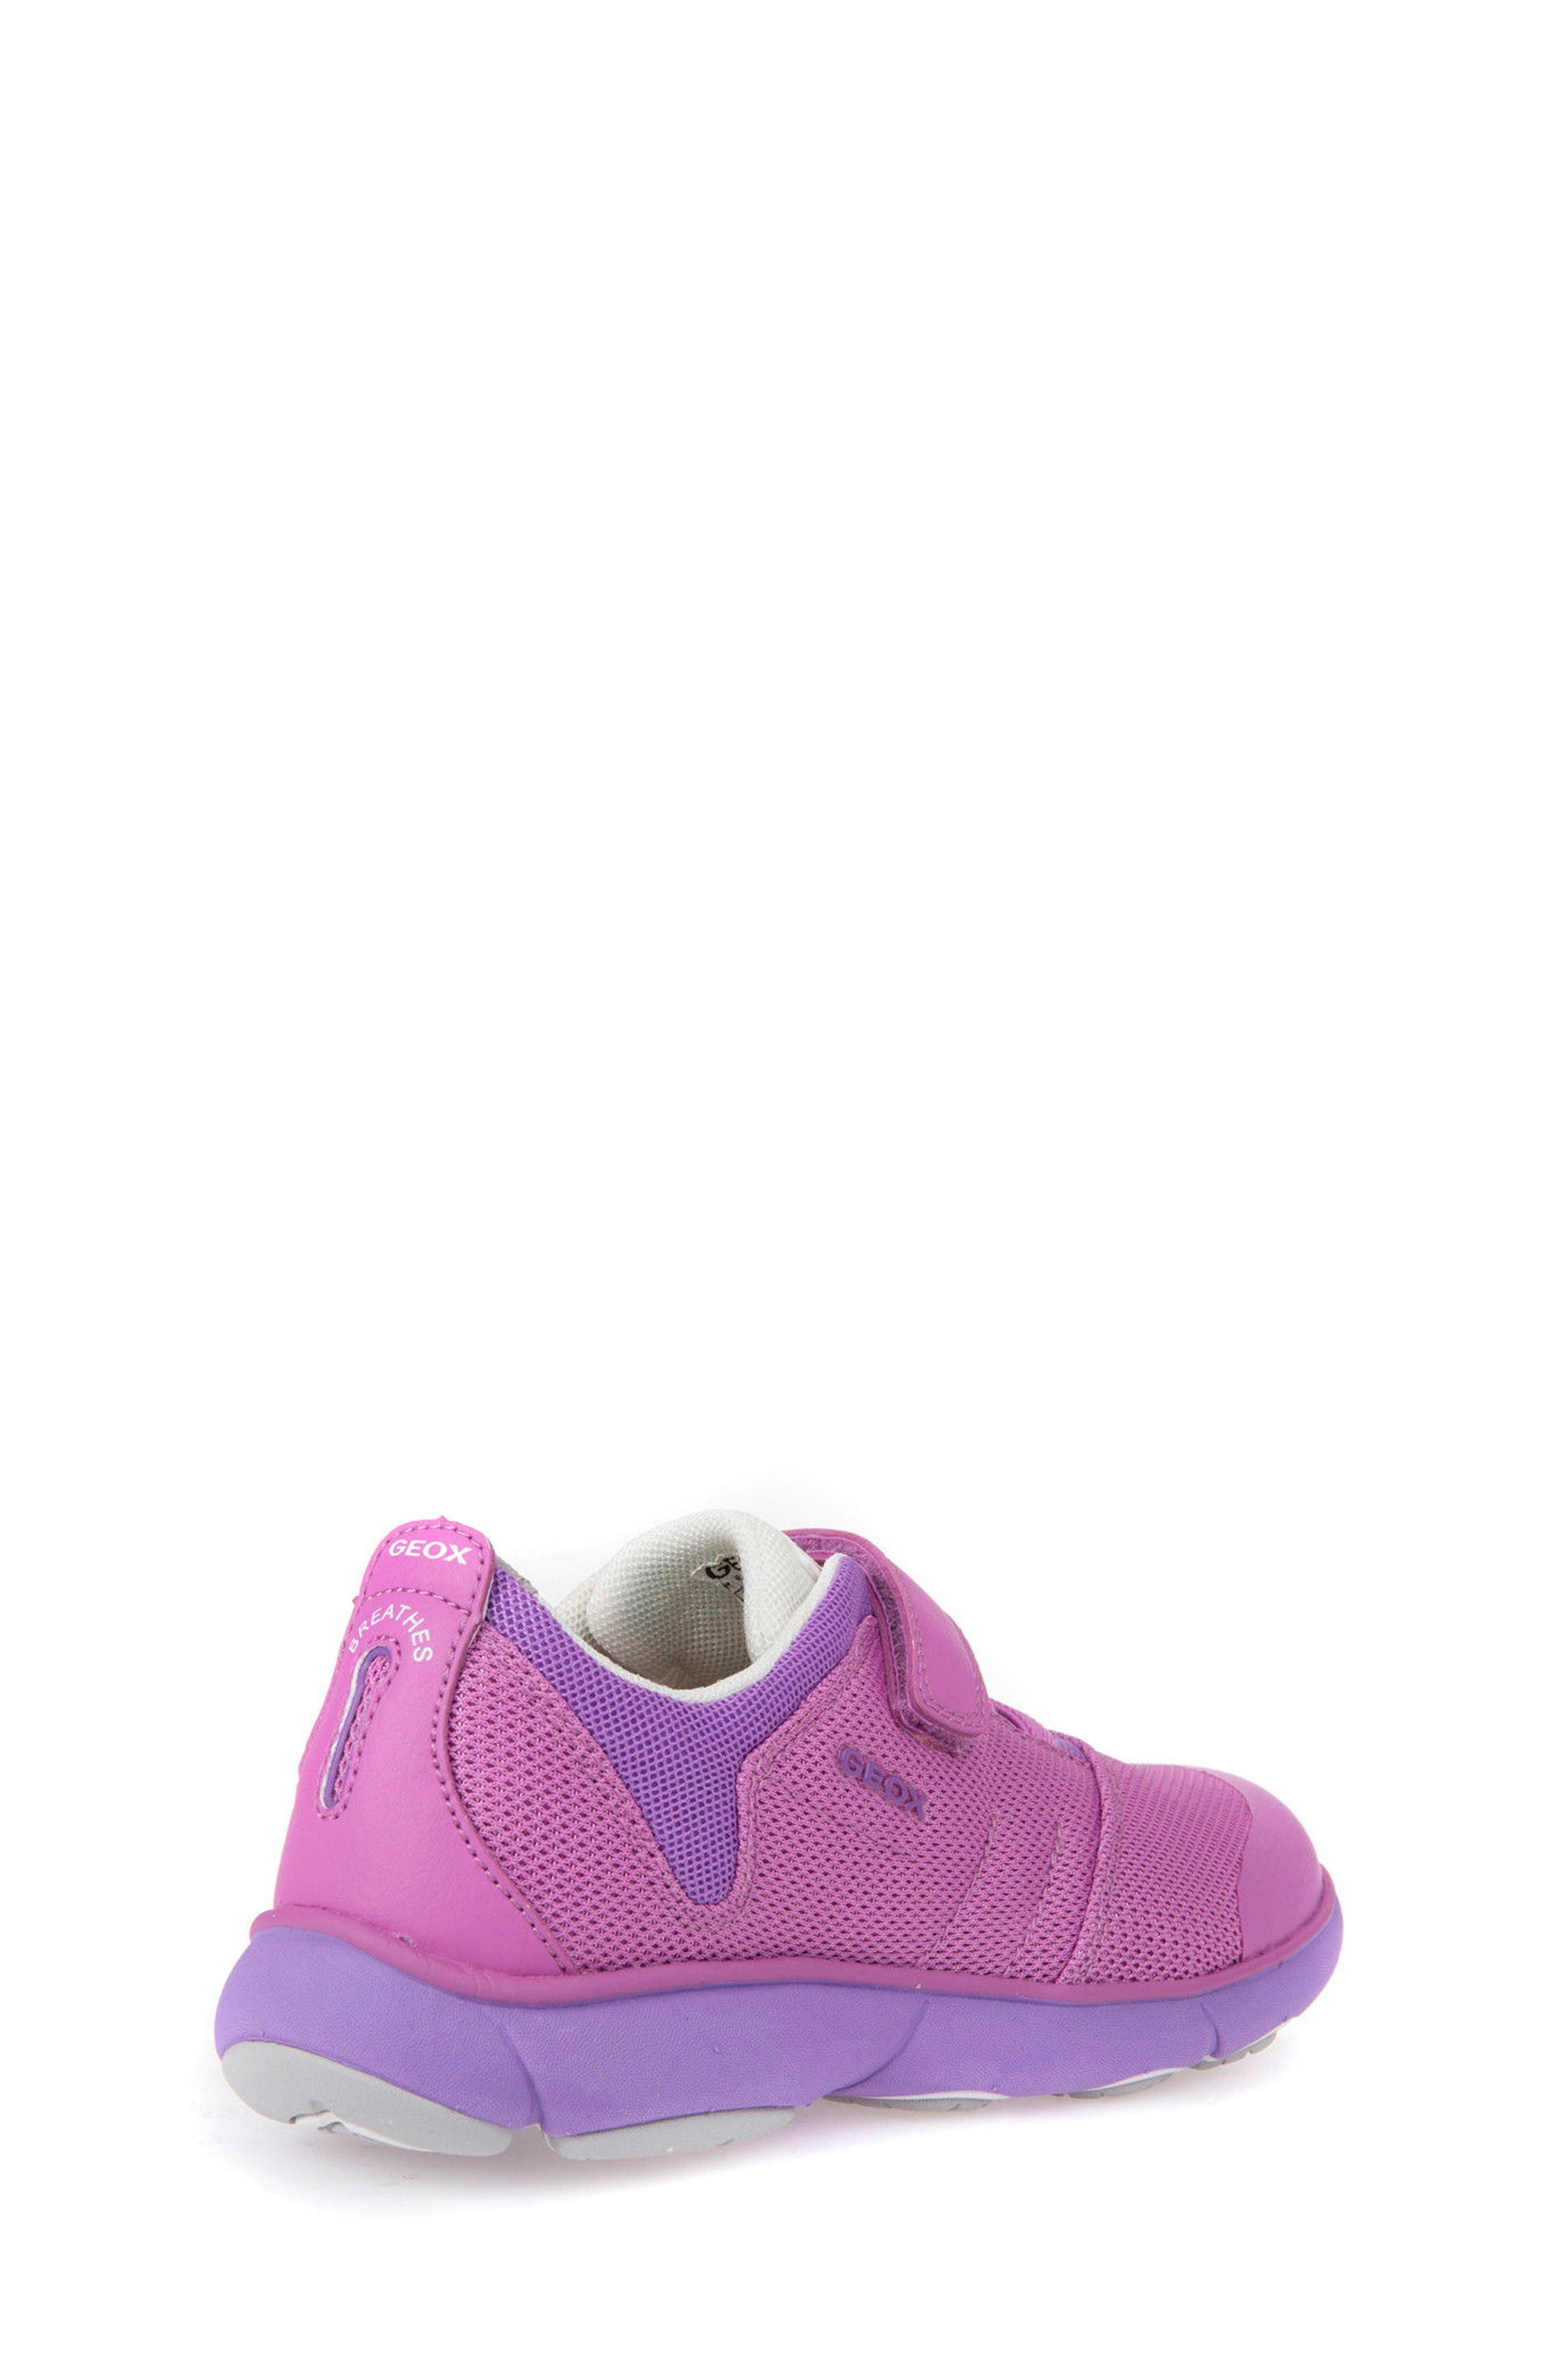 Jr Nebula Sneaker,                             Alternate thumbnail 7, color,                             Fuchsia